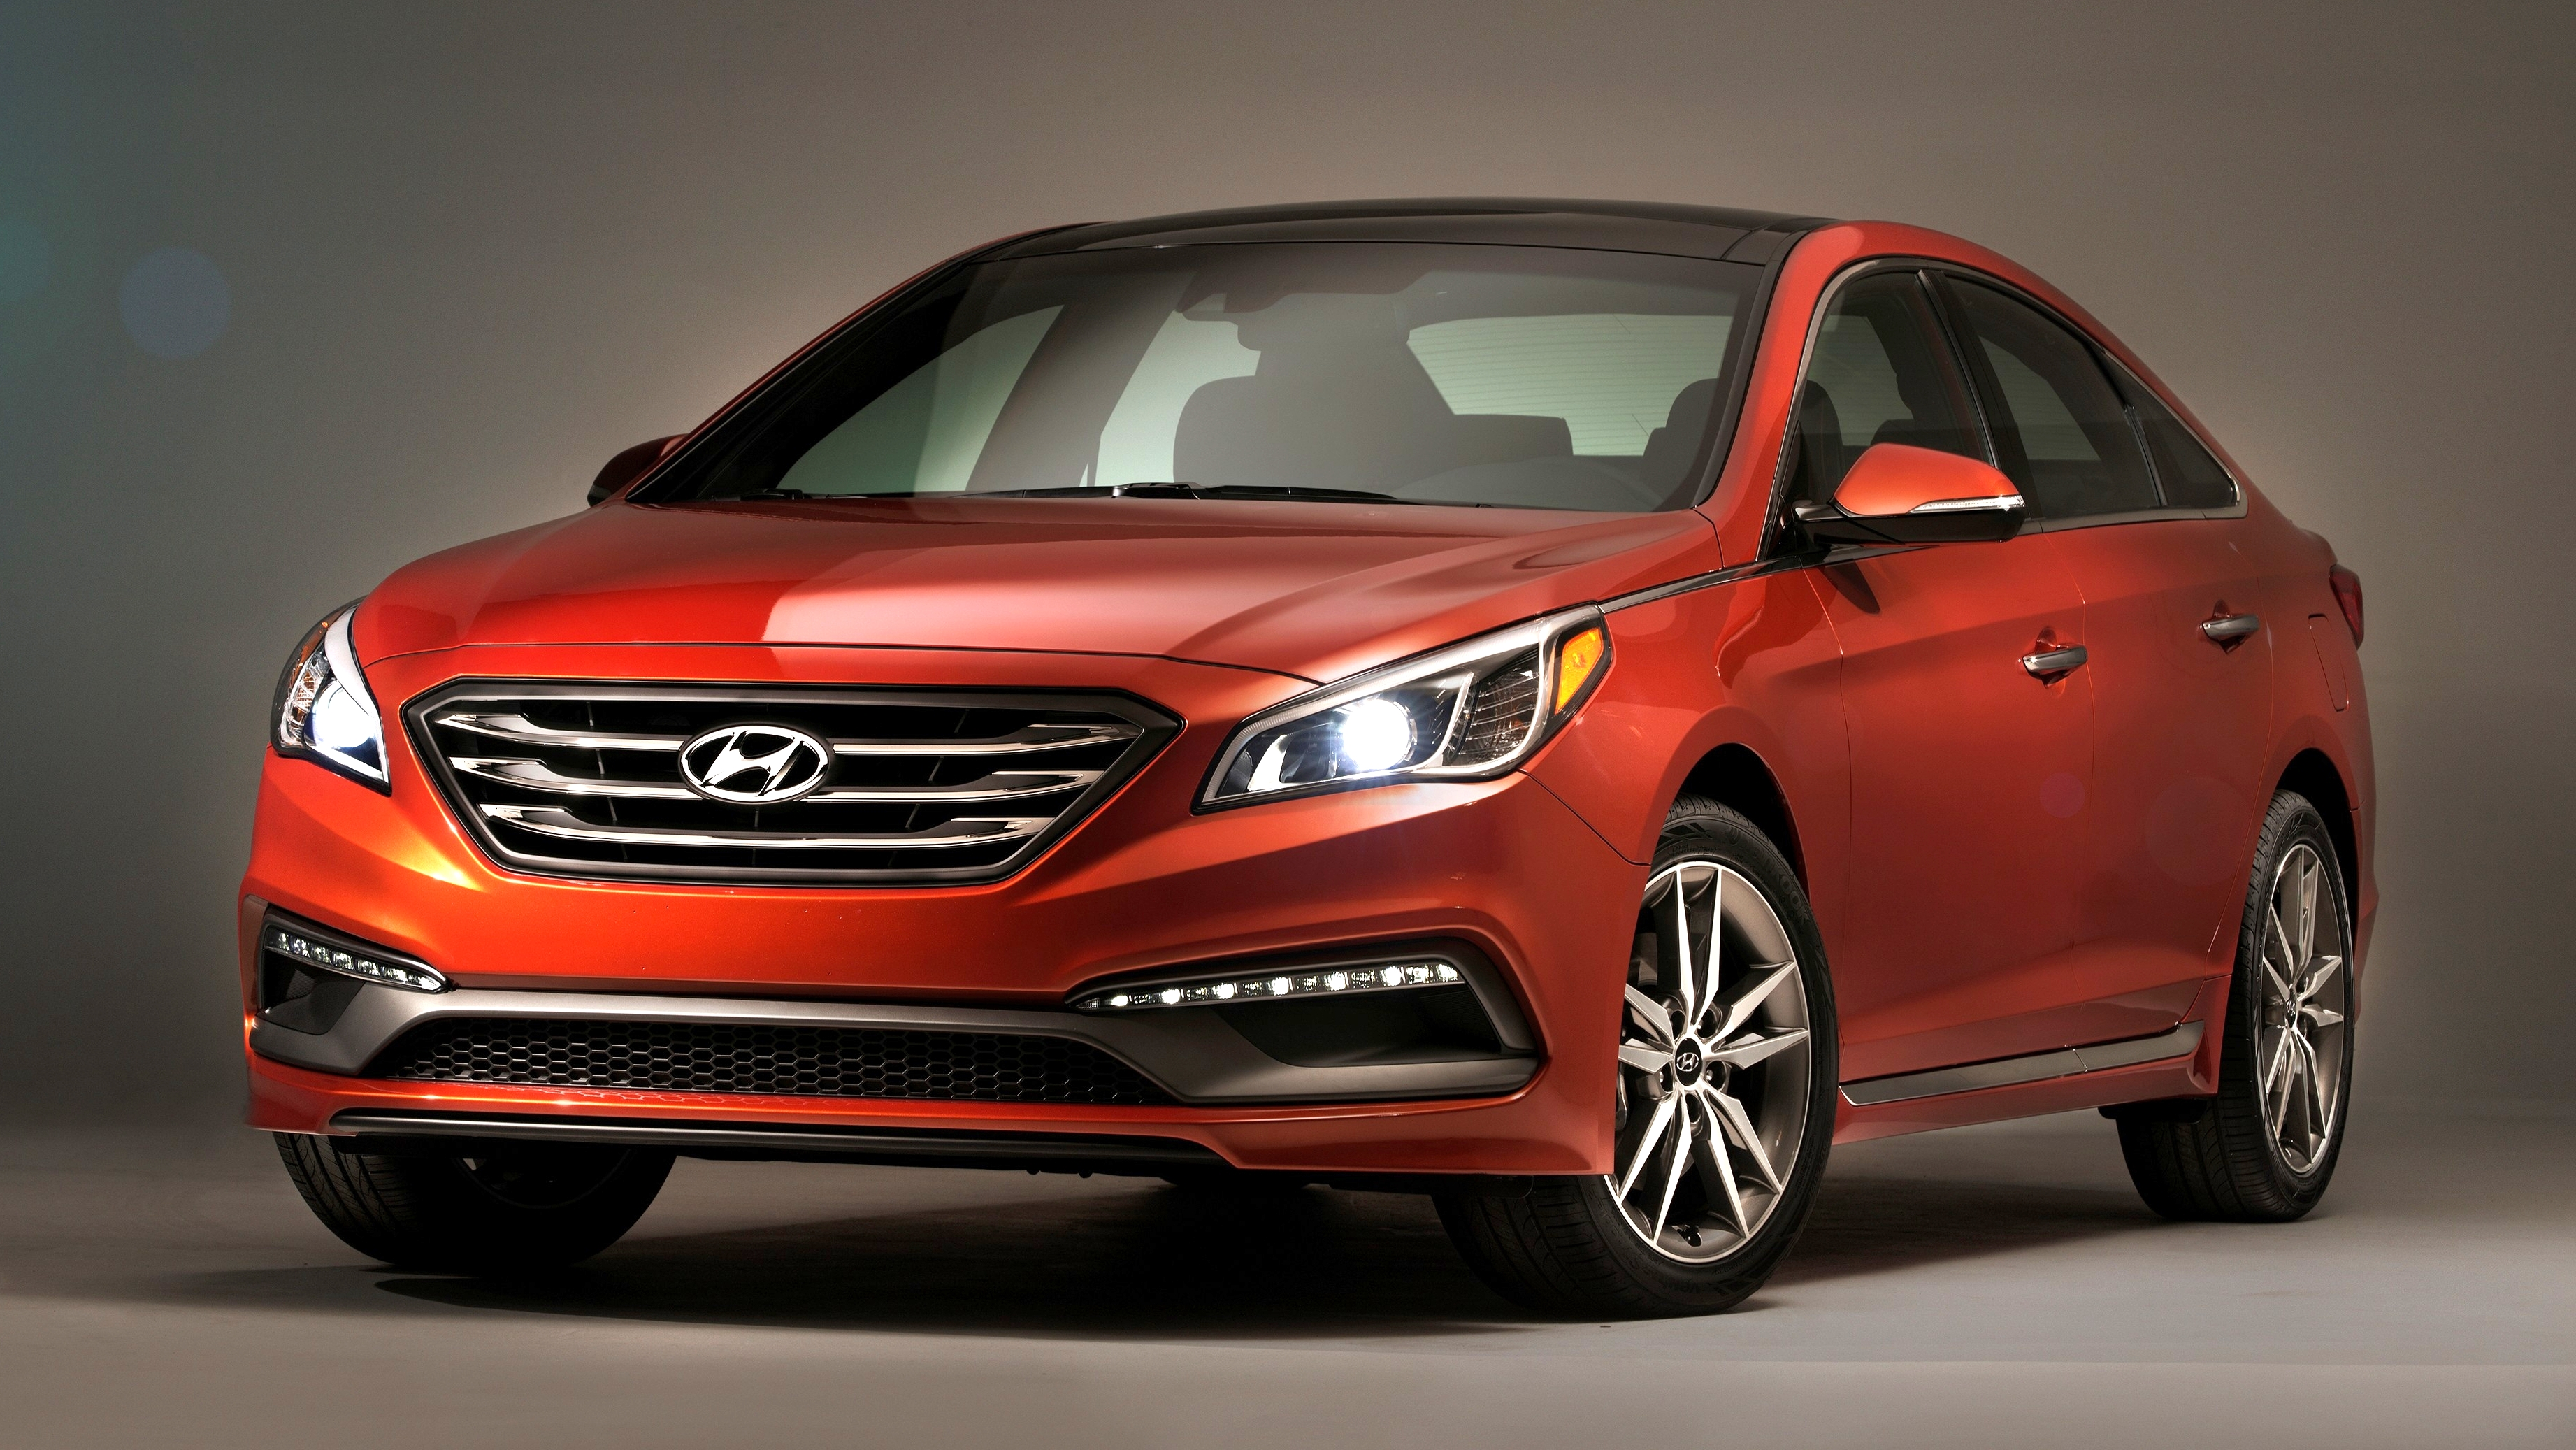 Hyundai Sonata - 140,000 recalled in USA and Canada